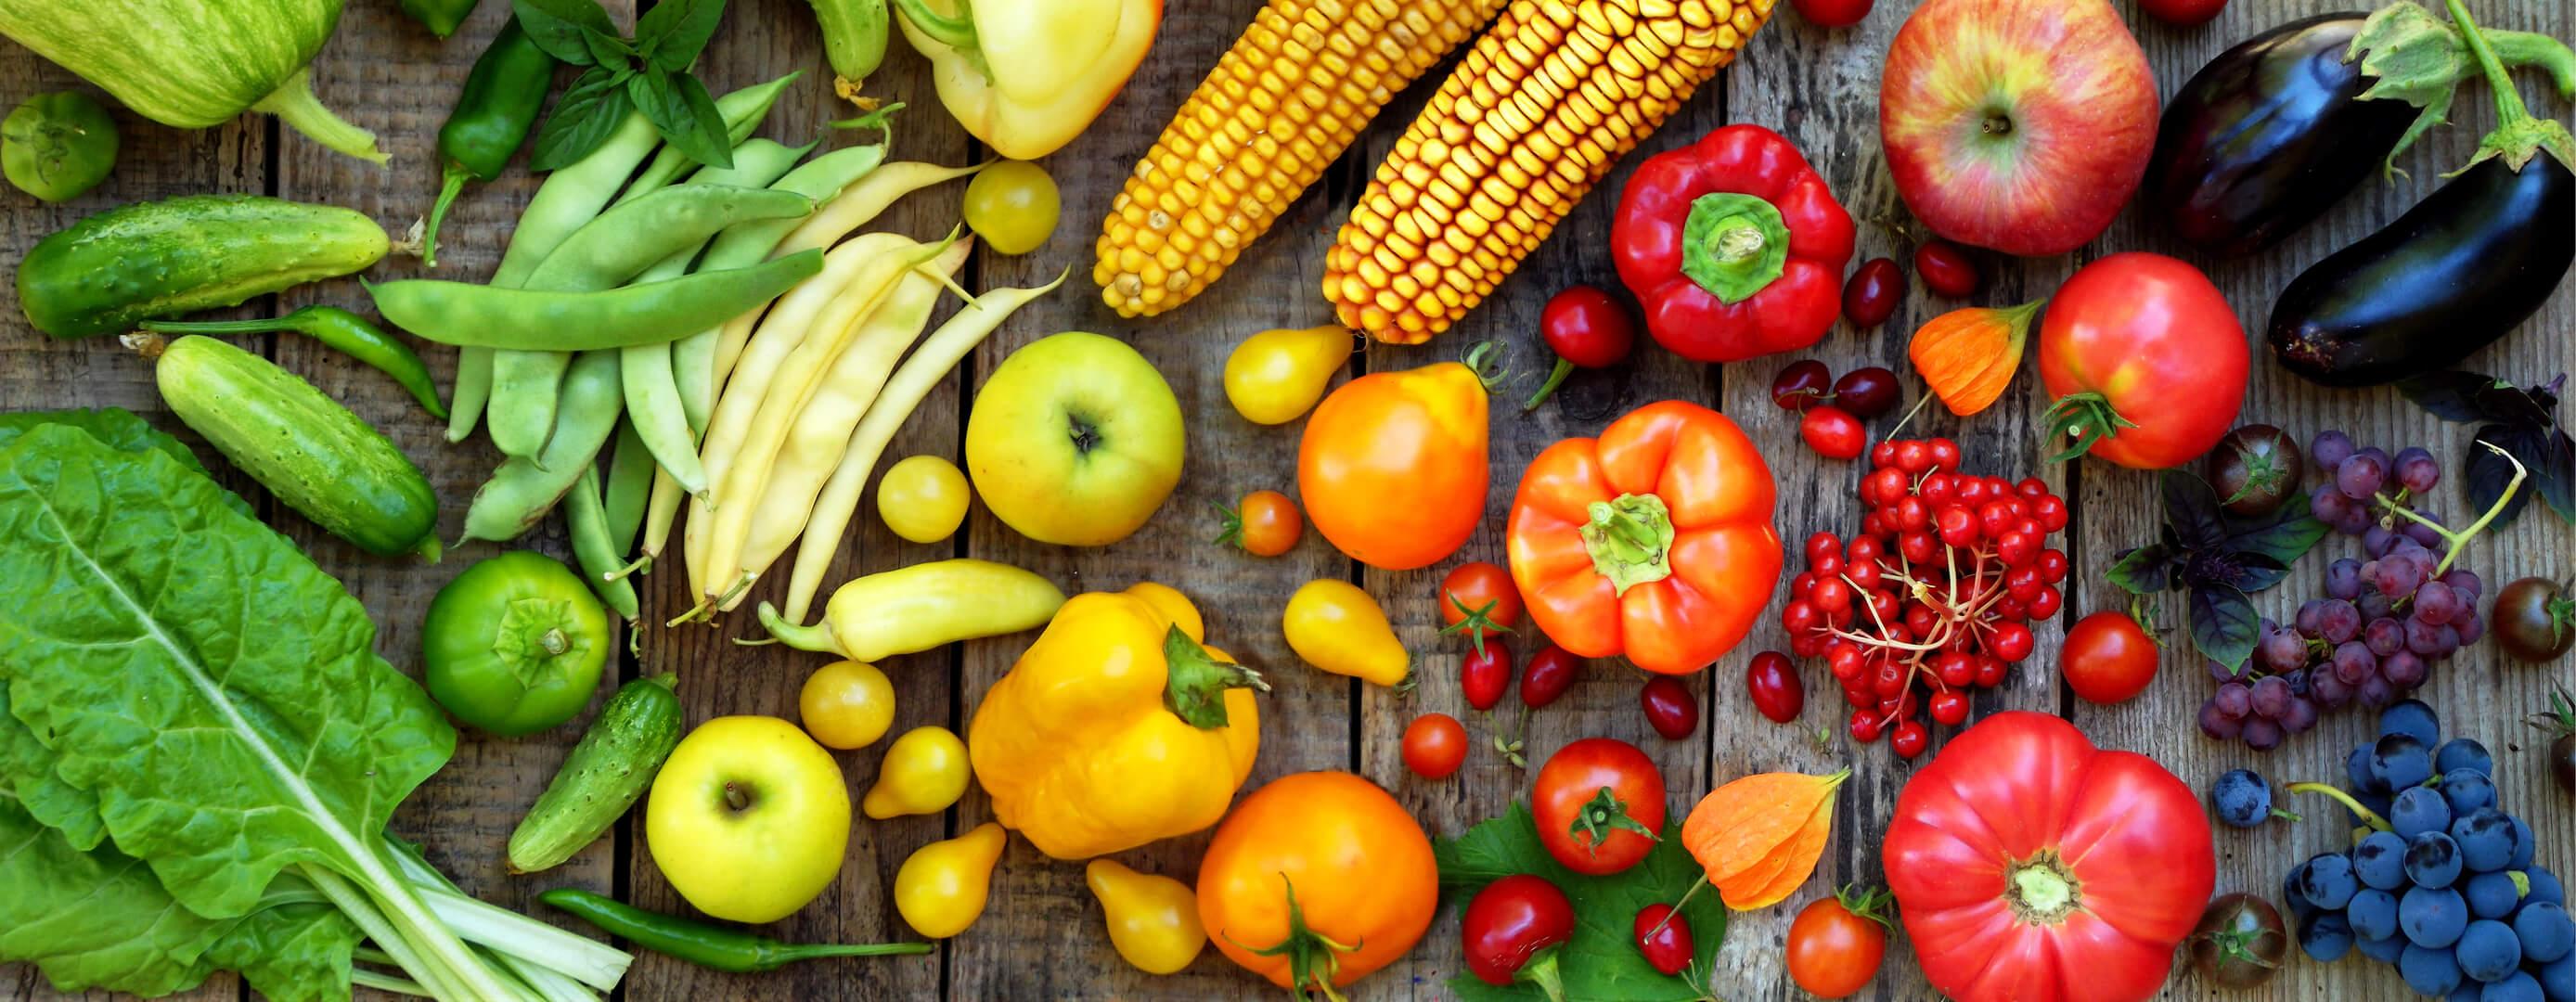 Law enforcement agencies get tougher on Food Crime